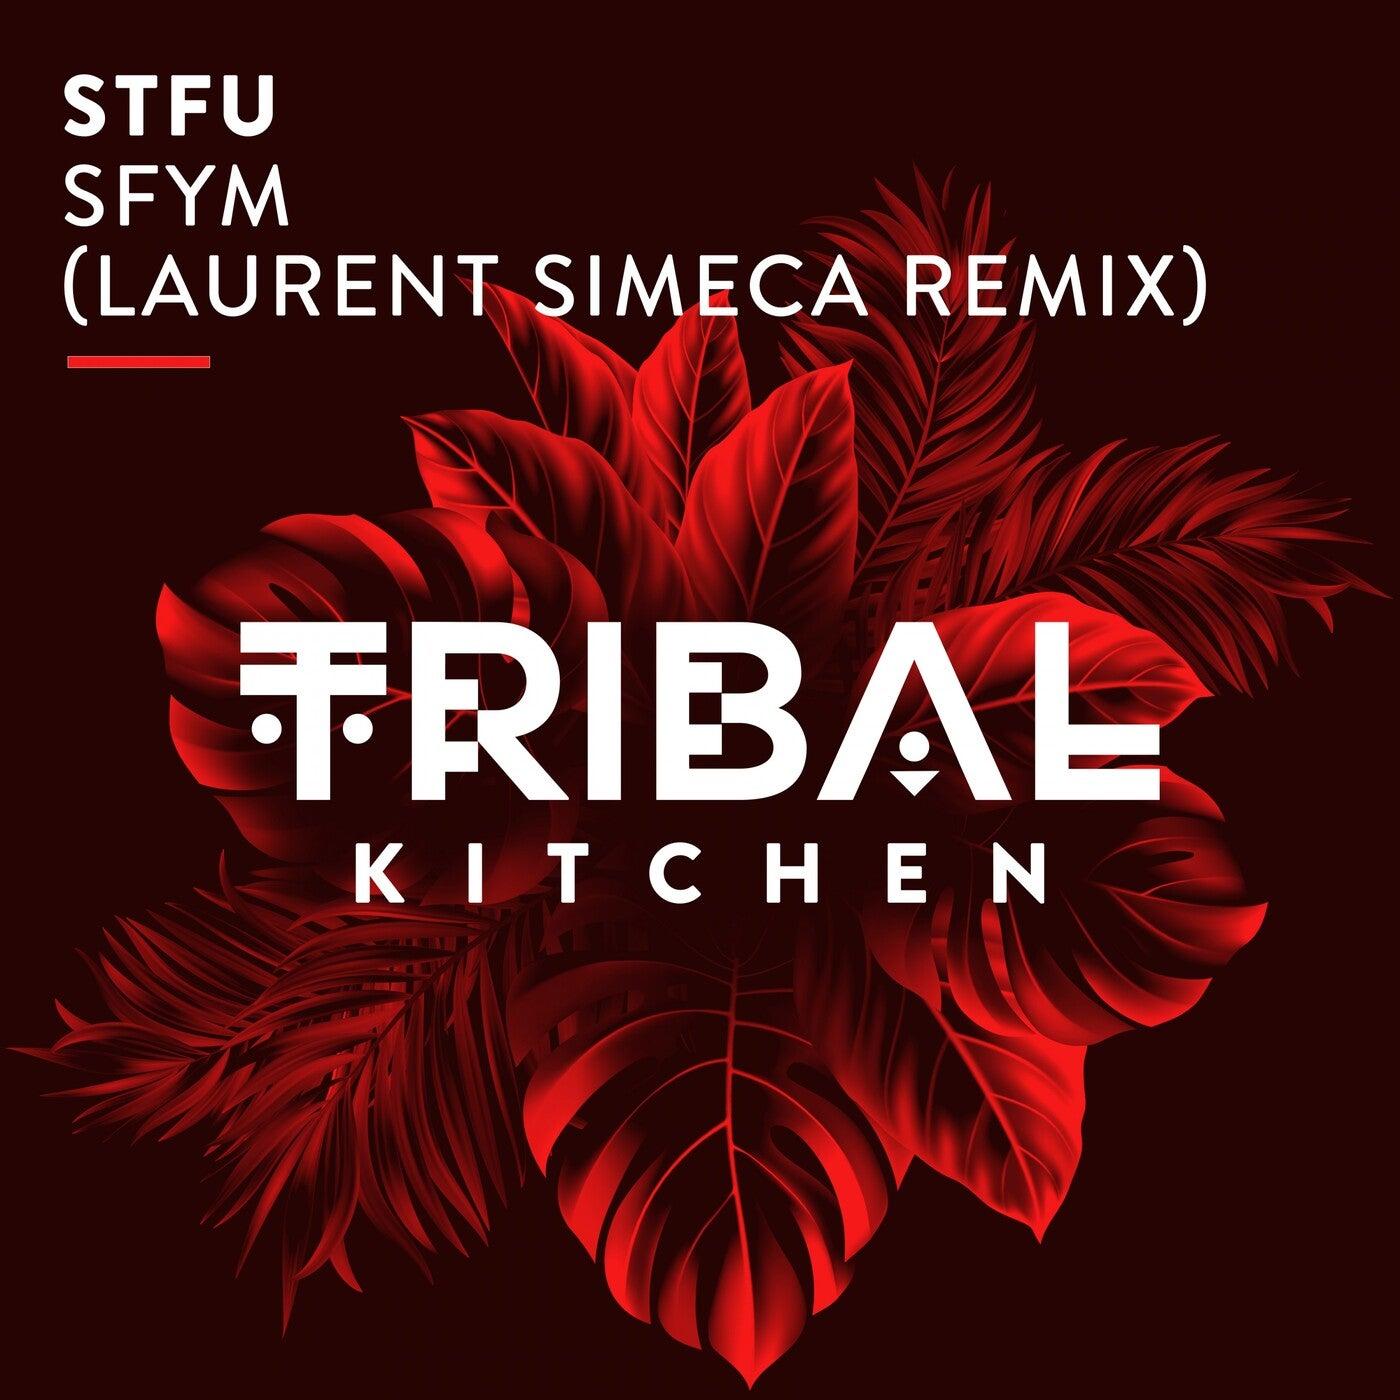 SFYM 2021 (Laurent Simeca Extended Remix)